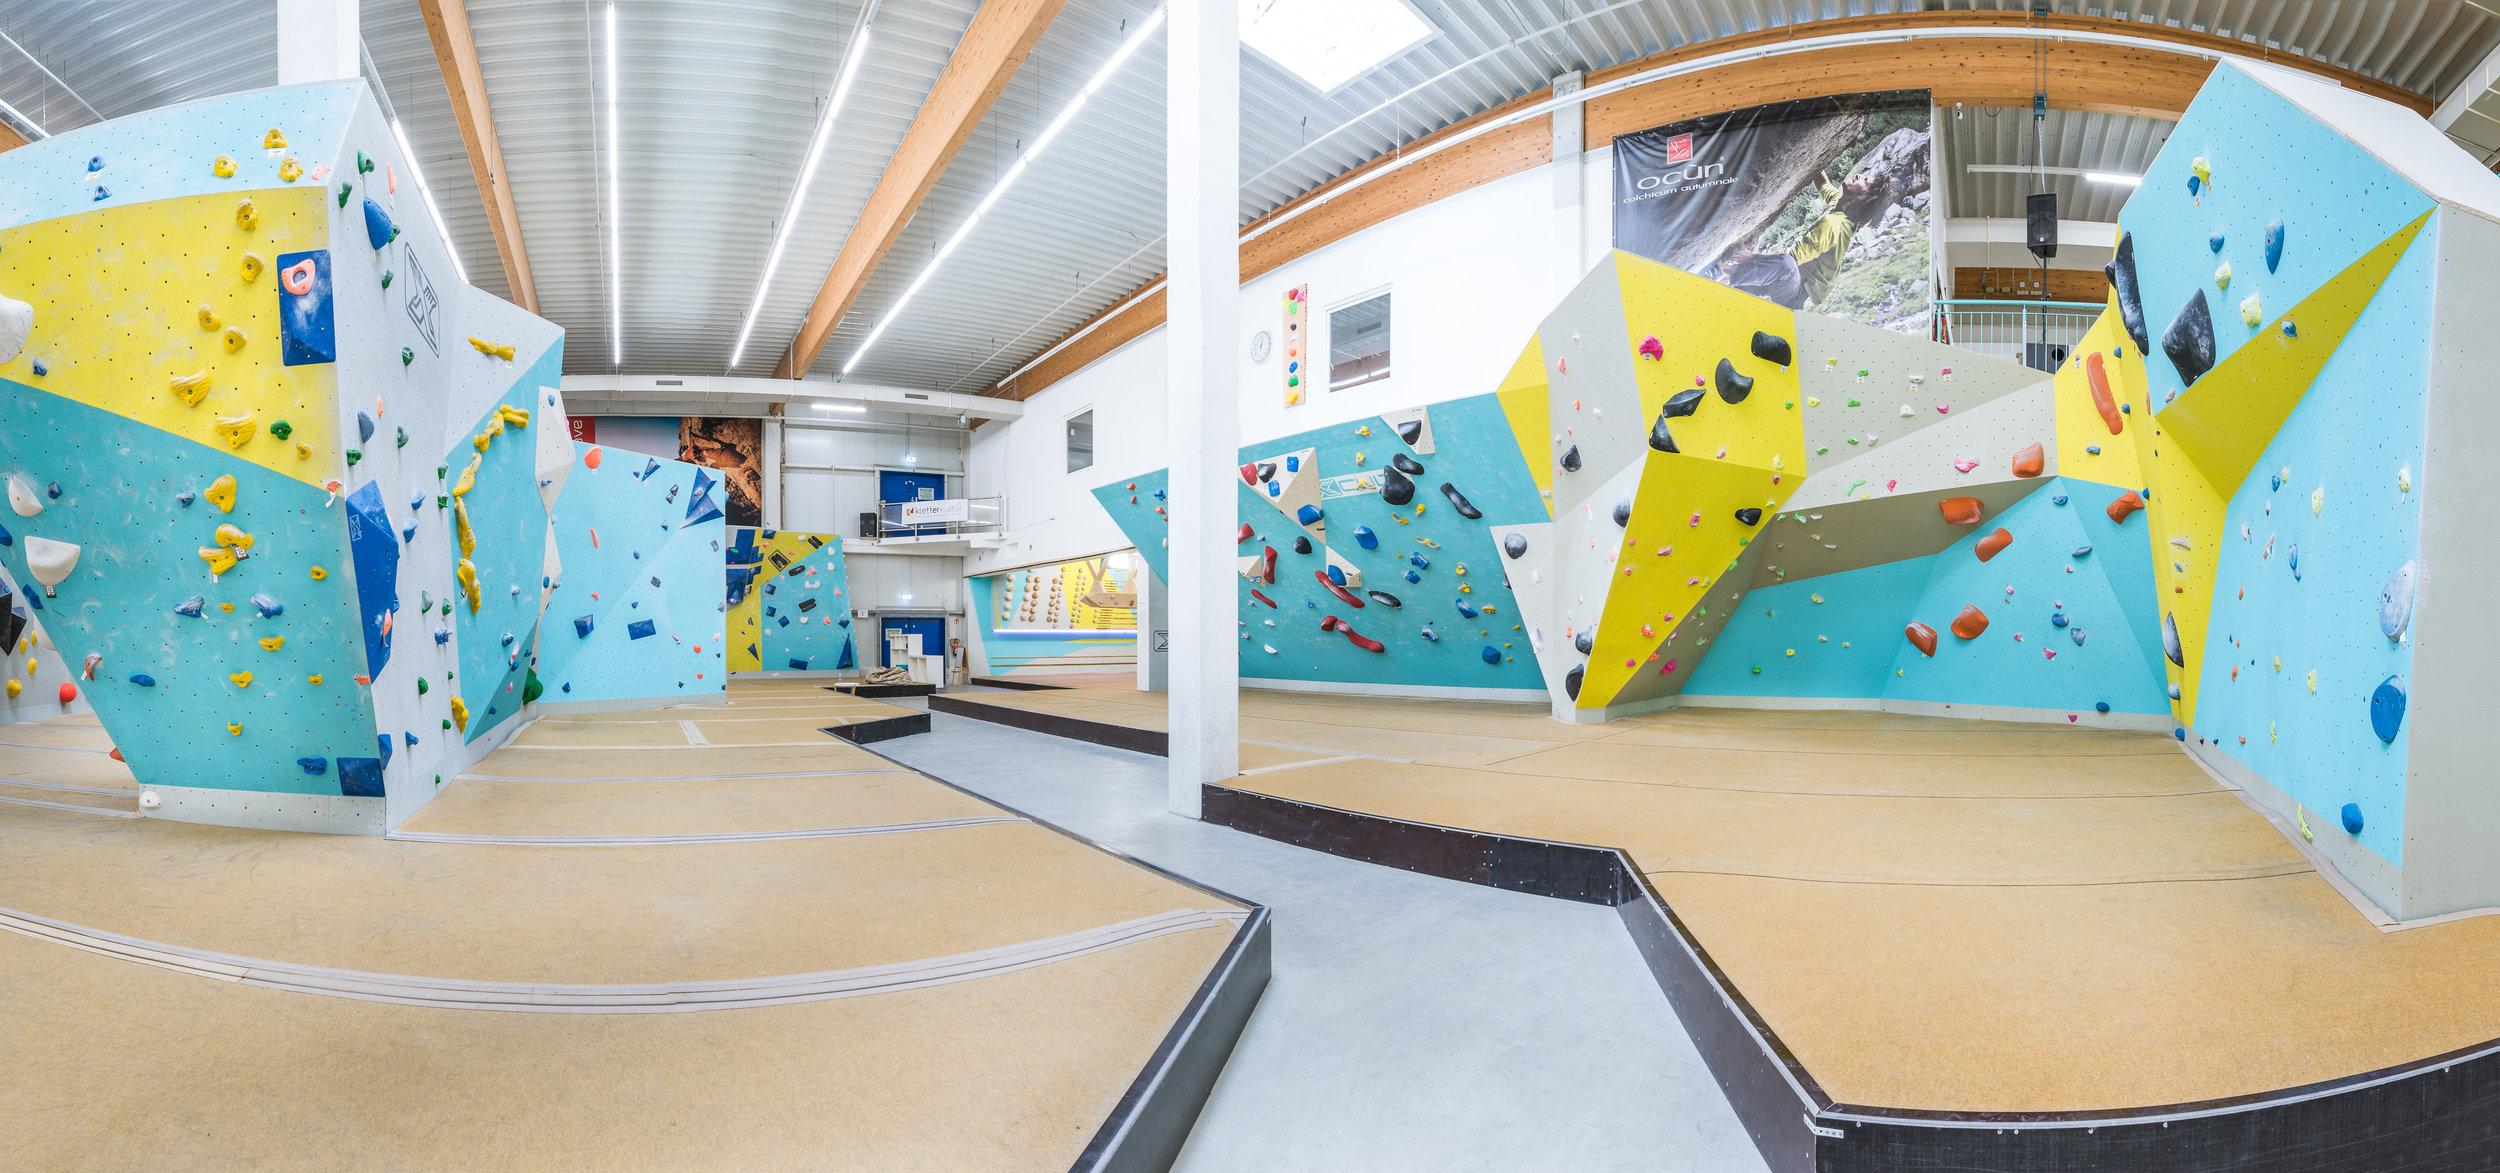 Boulderhalle Blockhaus Freiburg by Tom Bush